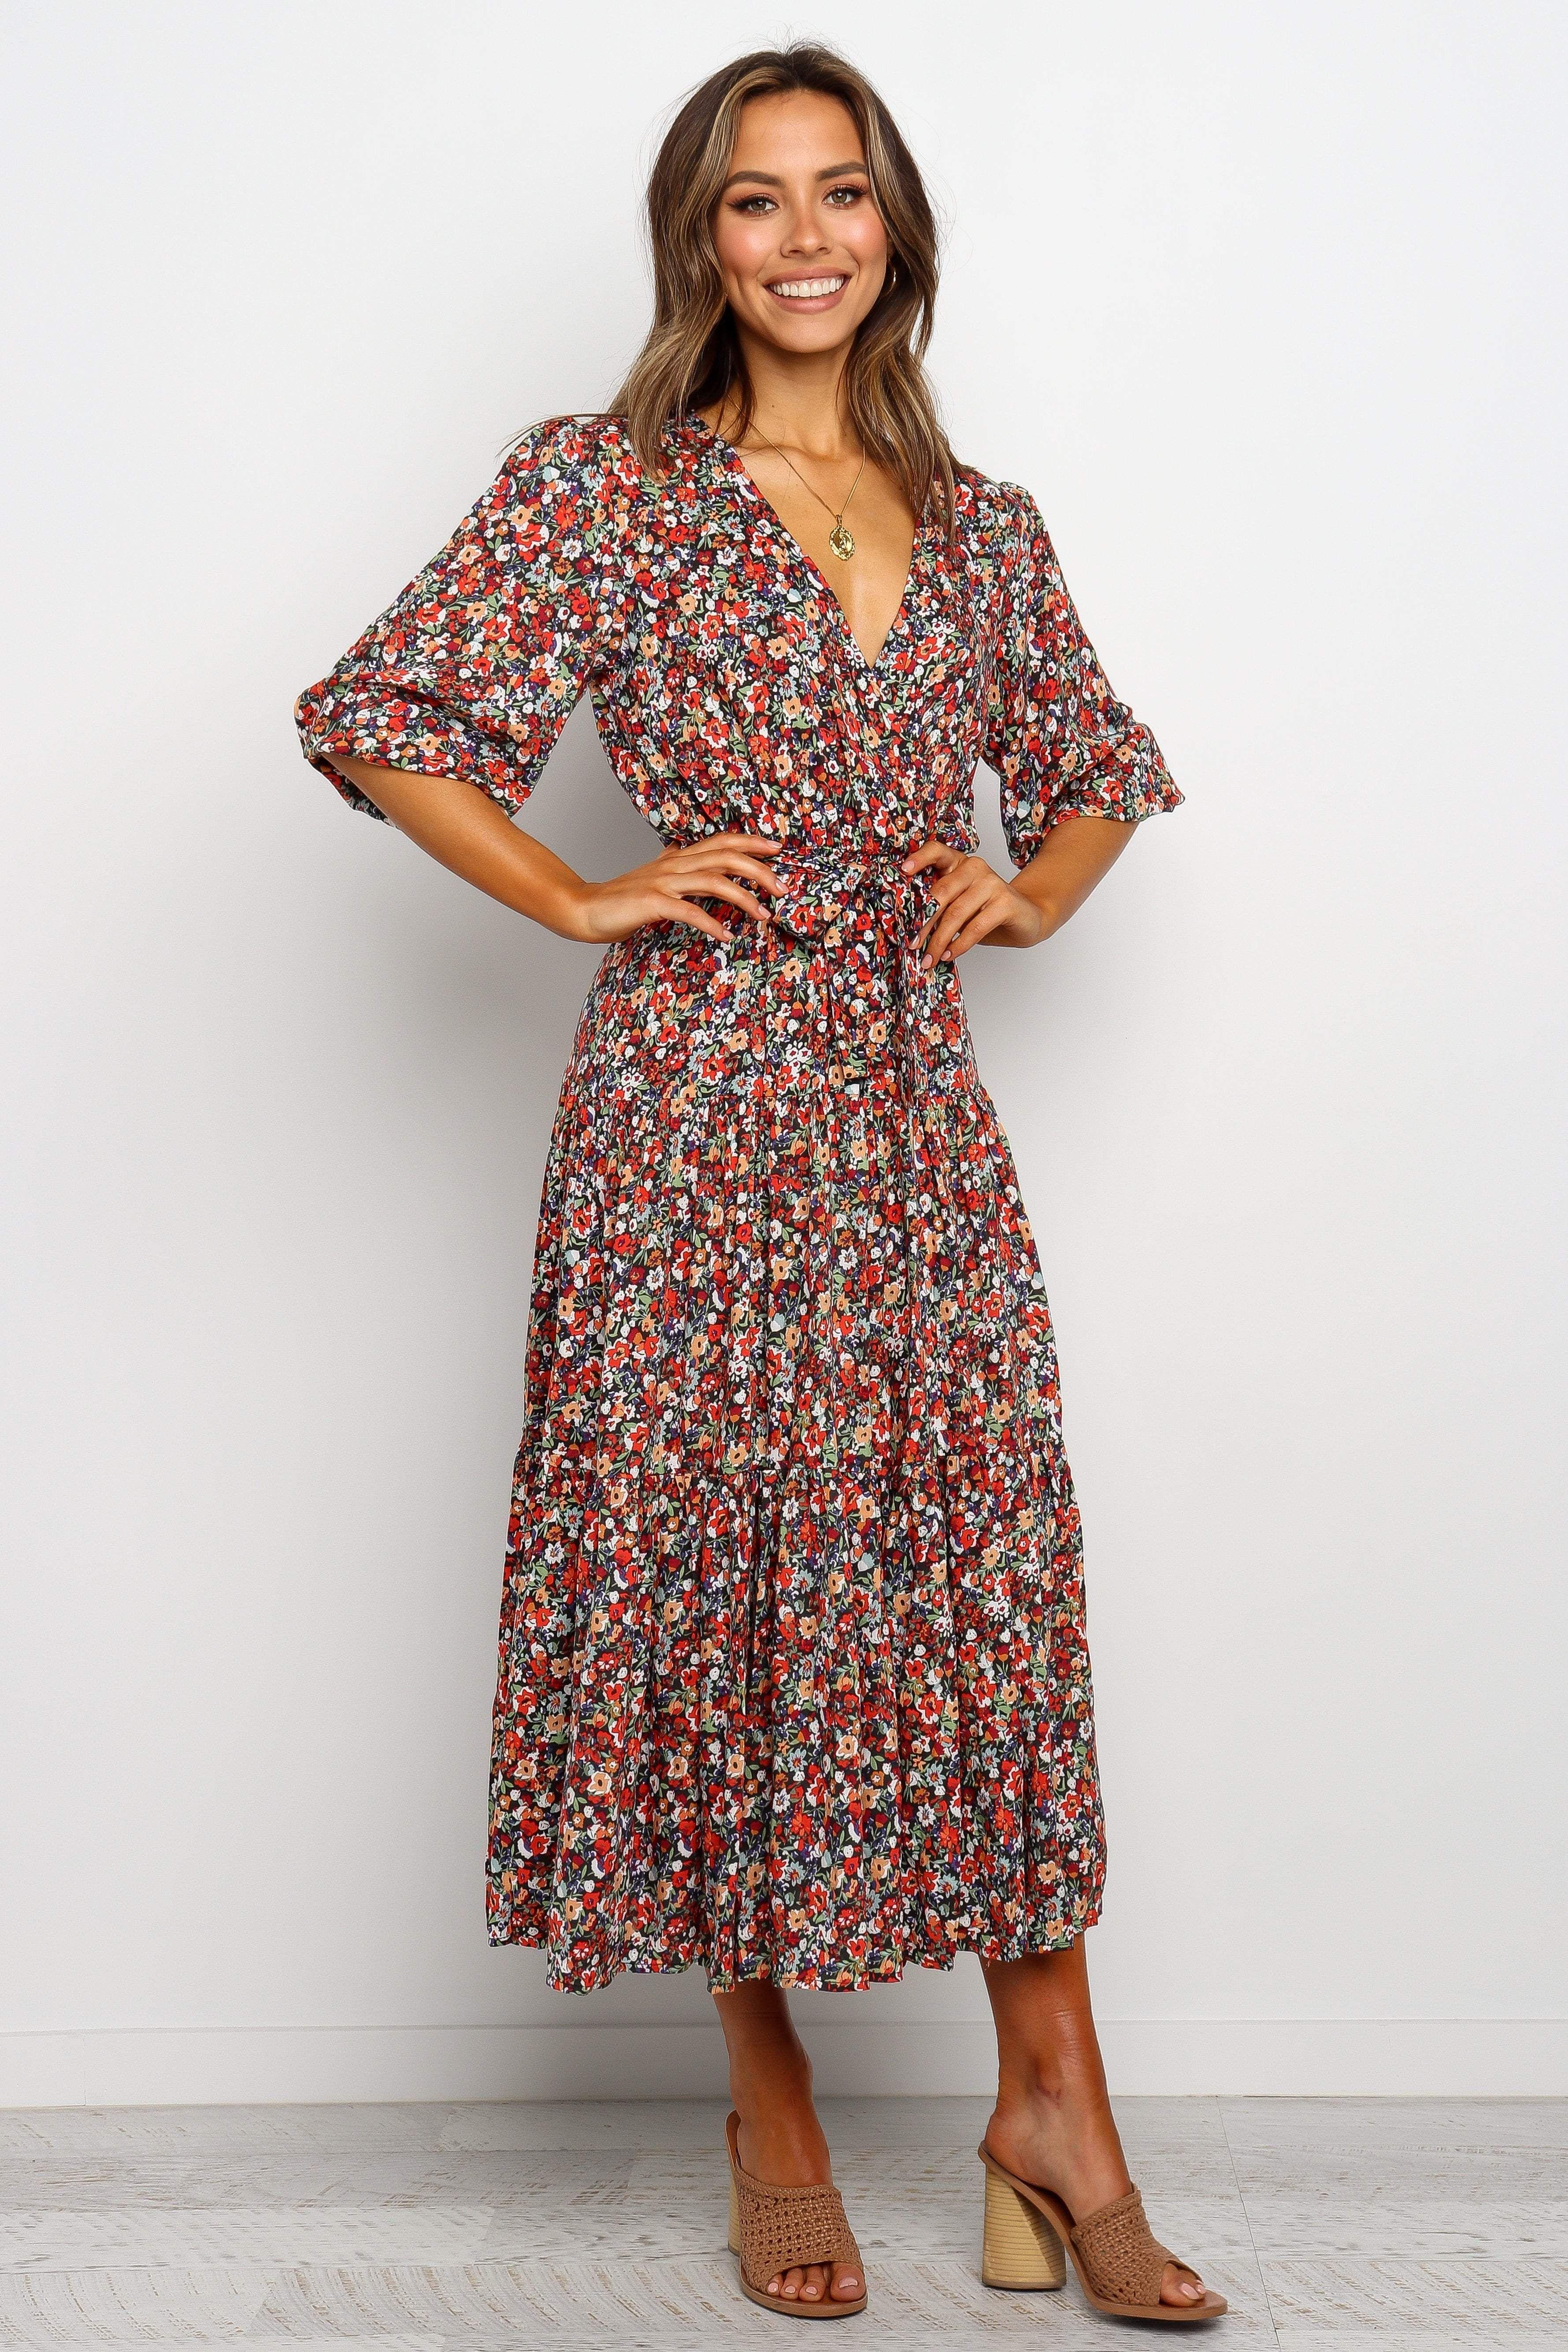 Rosalie Dress Multi In 2020 Casual Dresses Floral Dress Summer Print Dress [ 5338 x 3559 Pixel ]